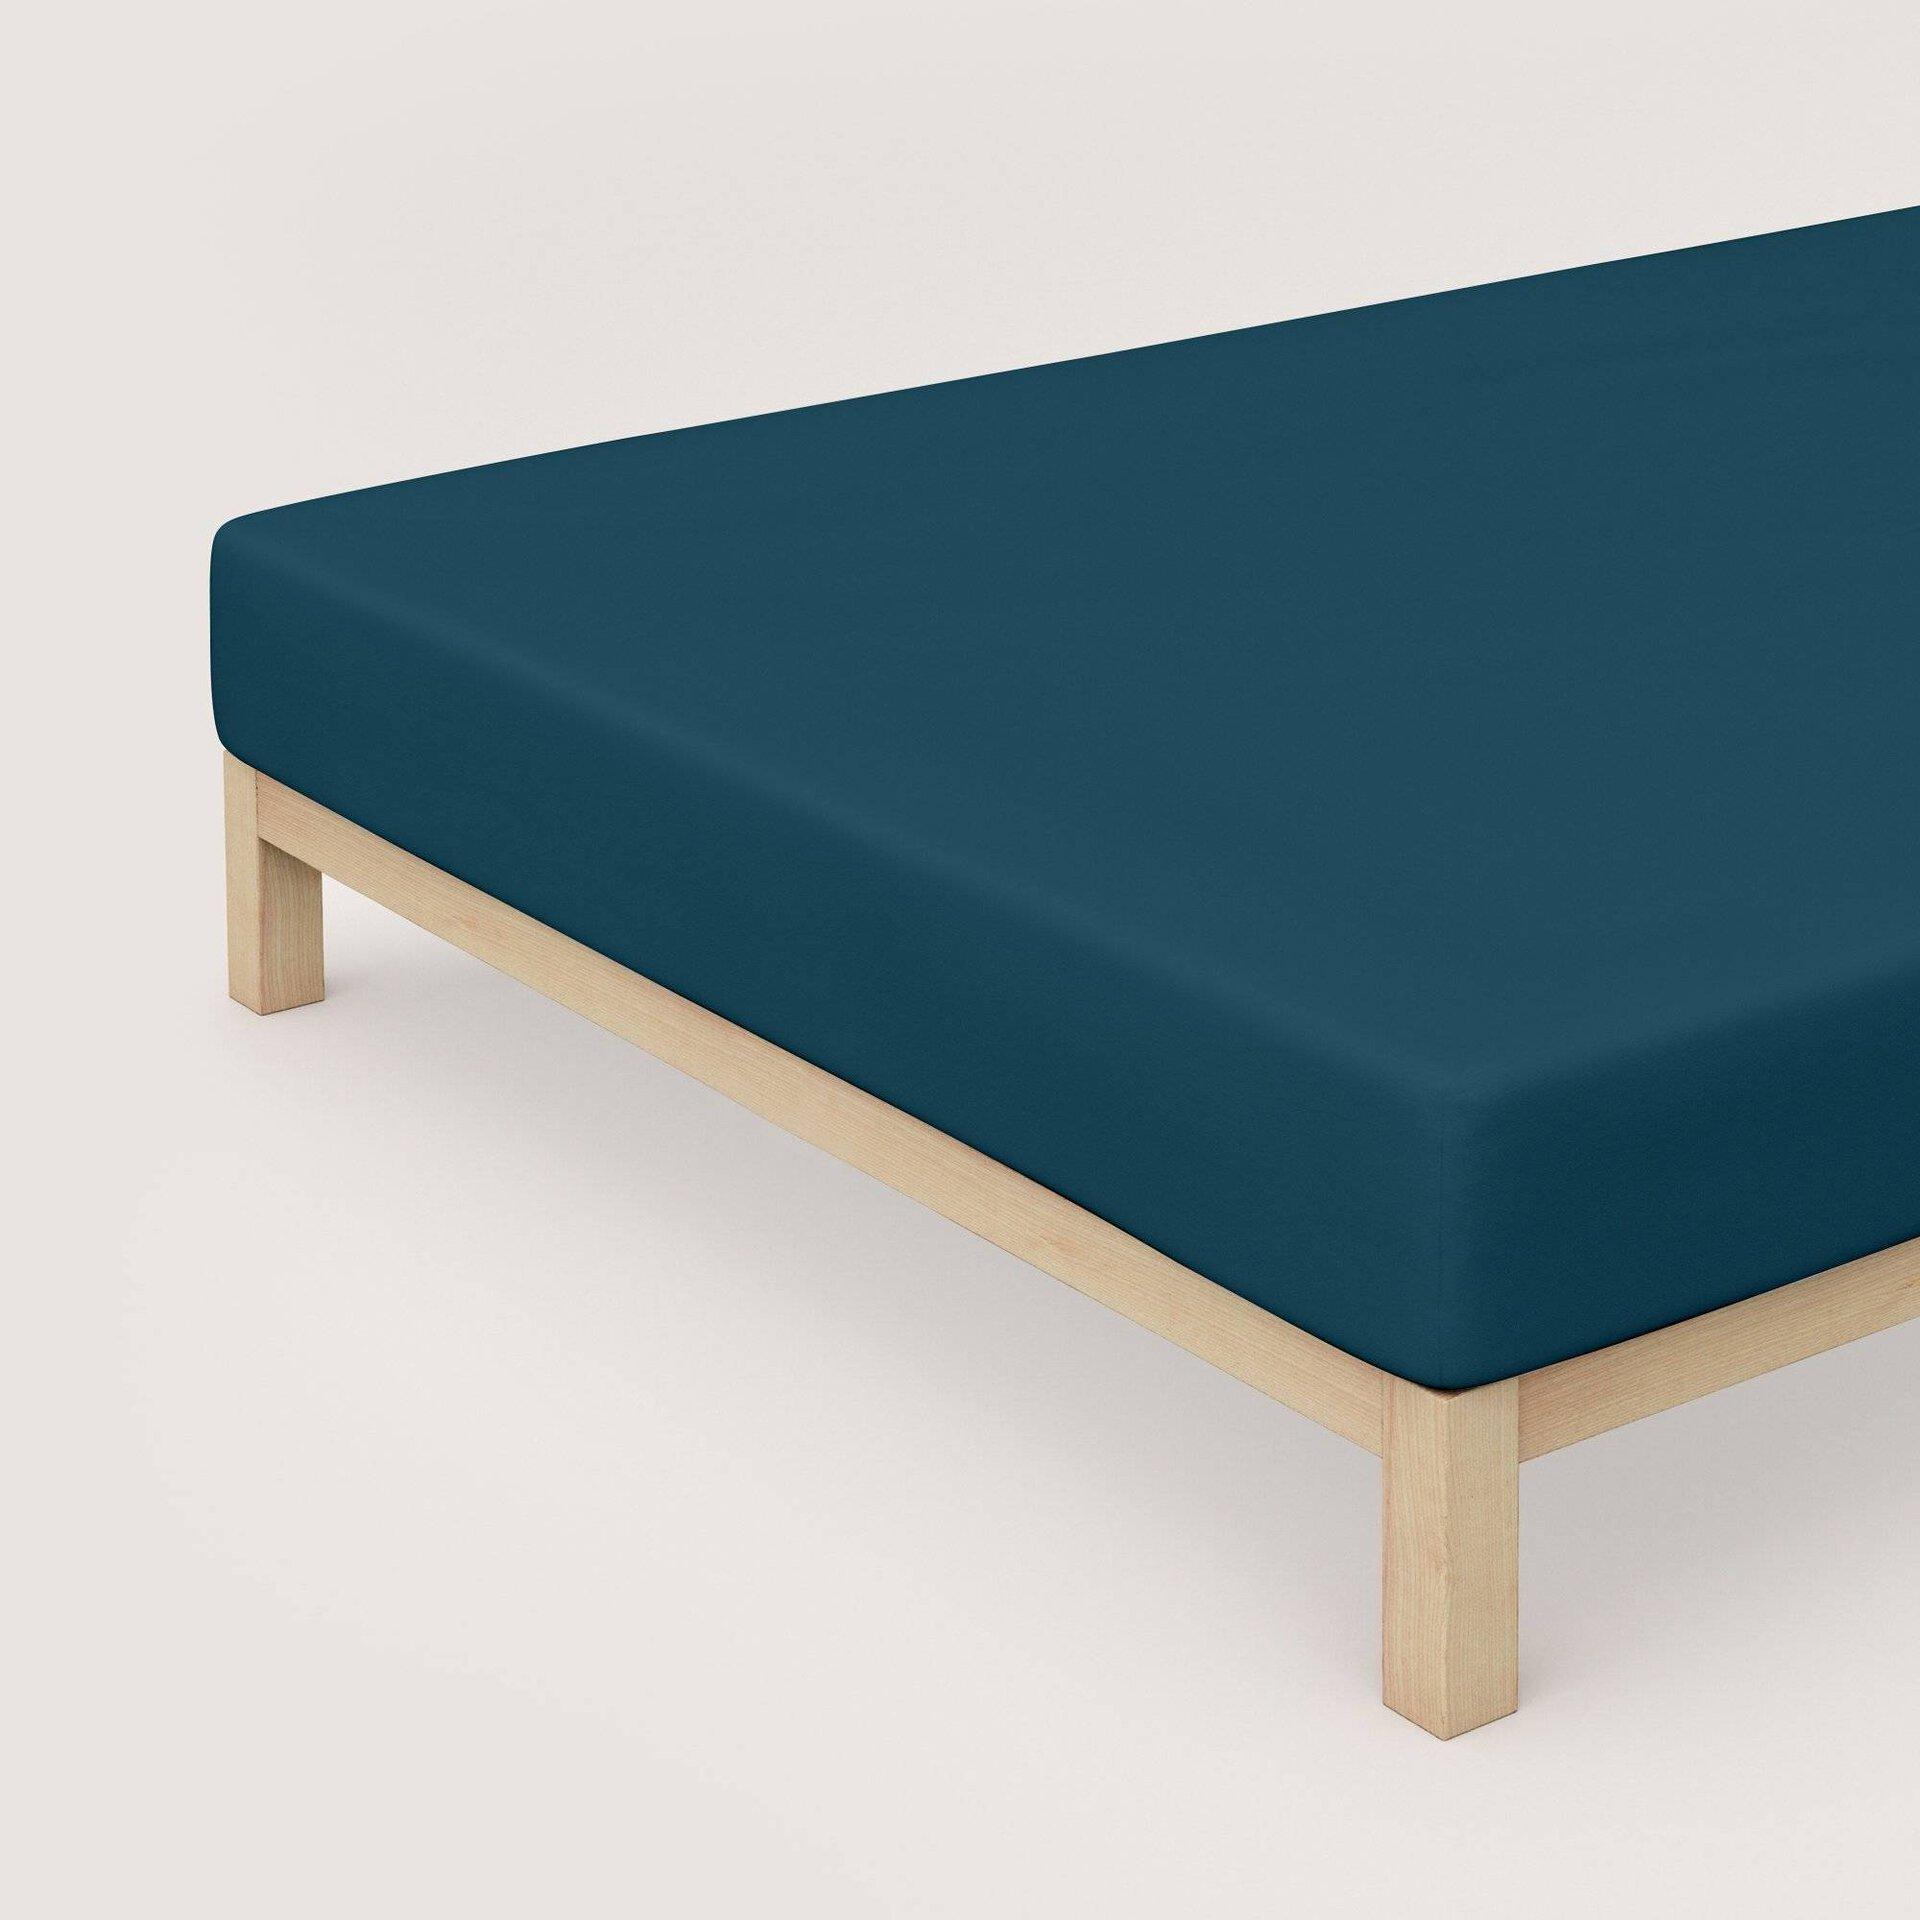 Jersey-Spannbetttuch Schlafgut Textil 150 x 200 cm